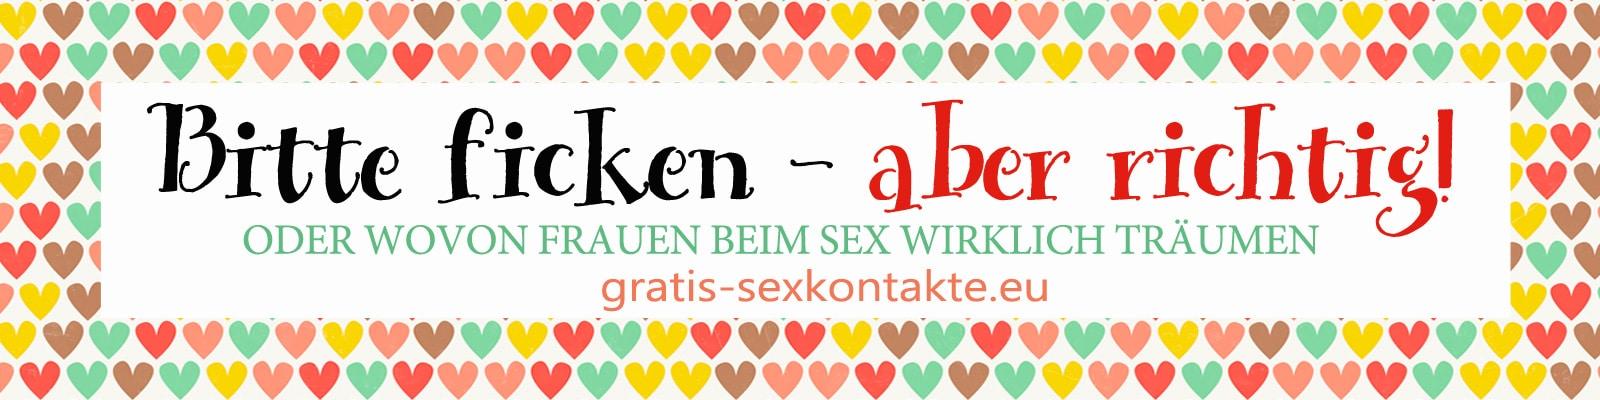 sexkontakte görlitz erotik chat kostenlos